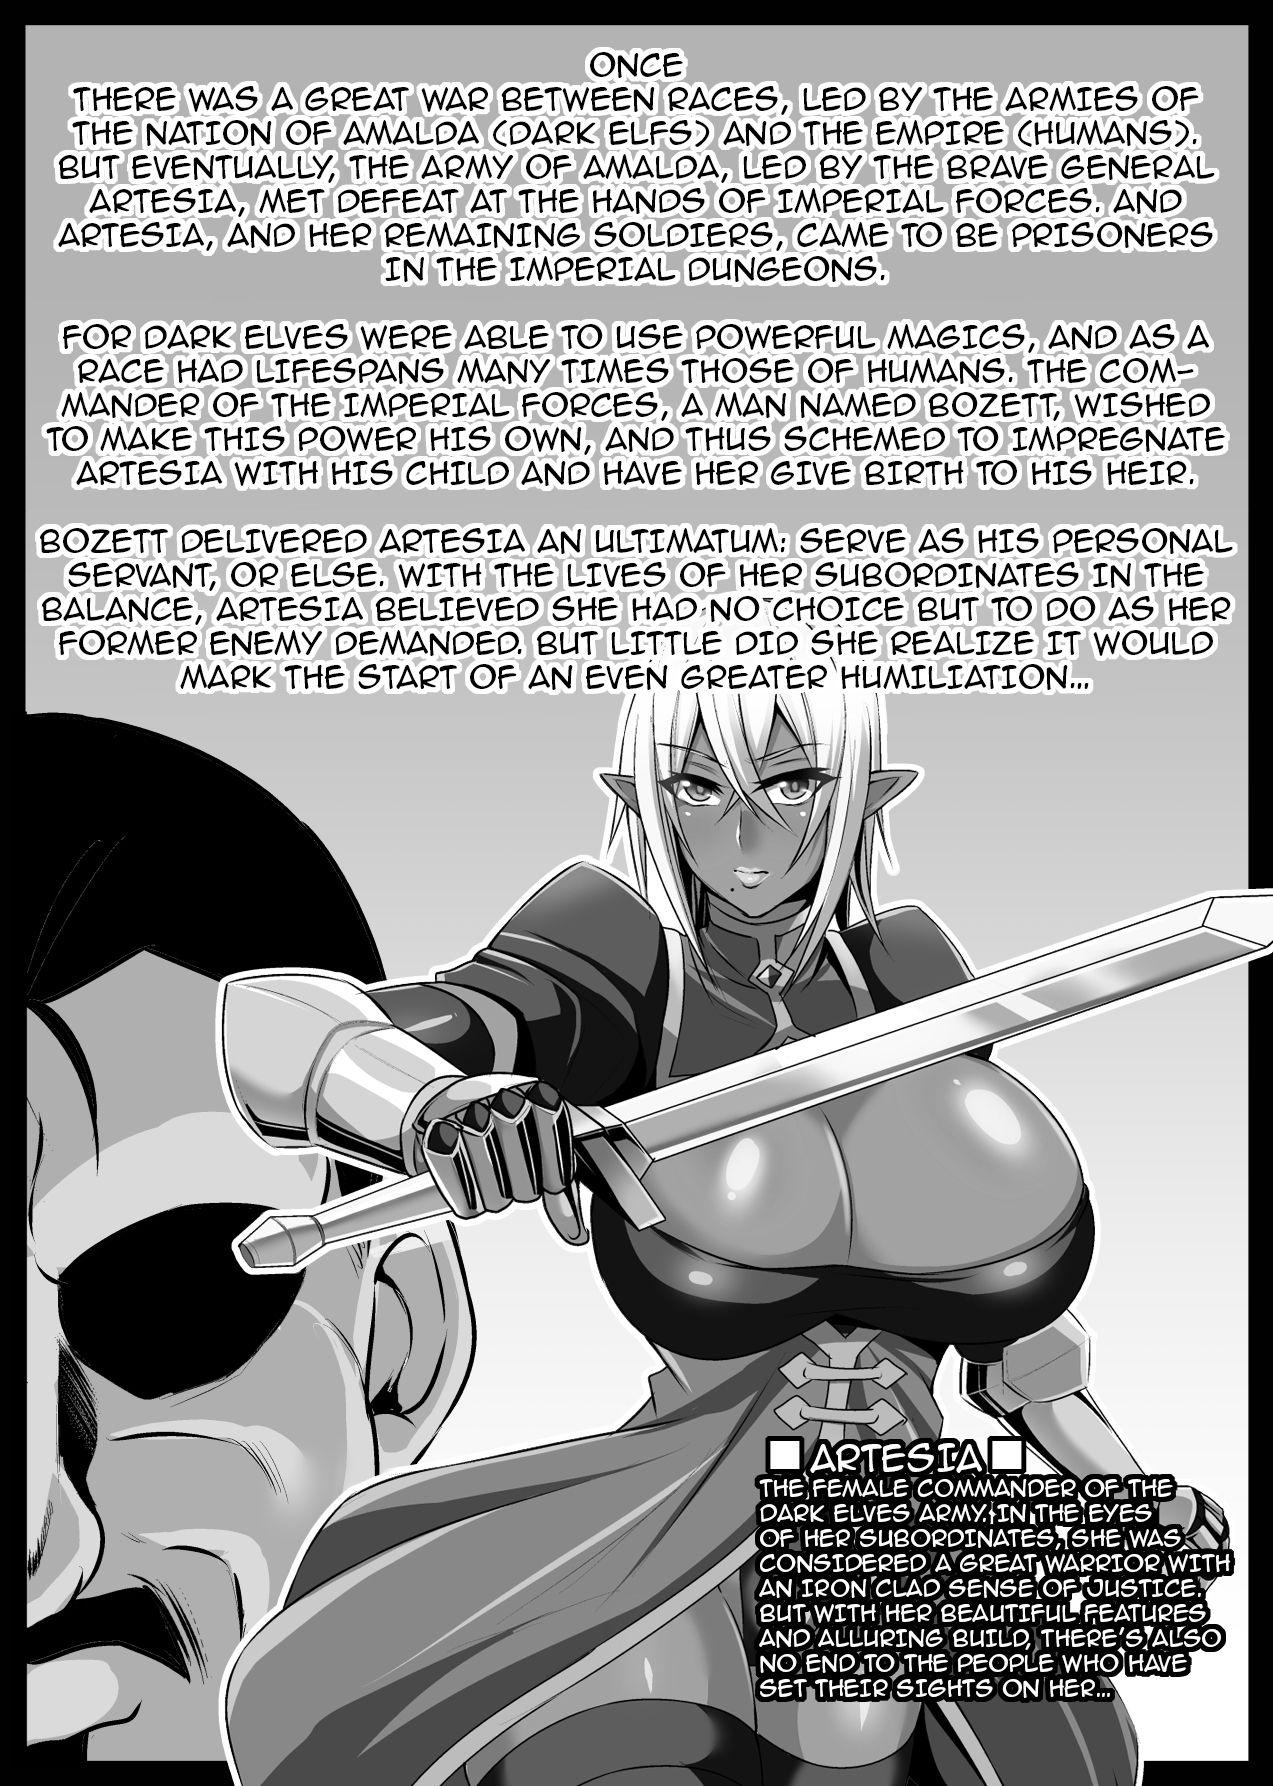 Onna Shougun Artesia - Dark Elf Haramase Choukyou Kiroku 1